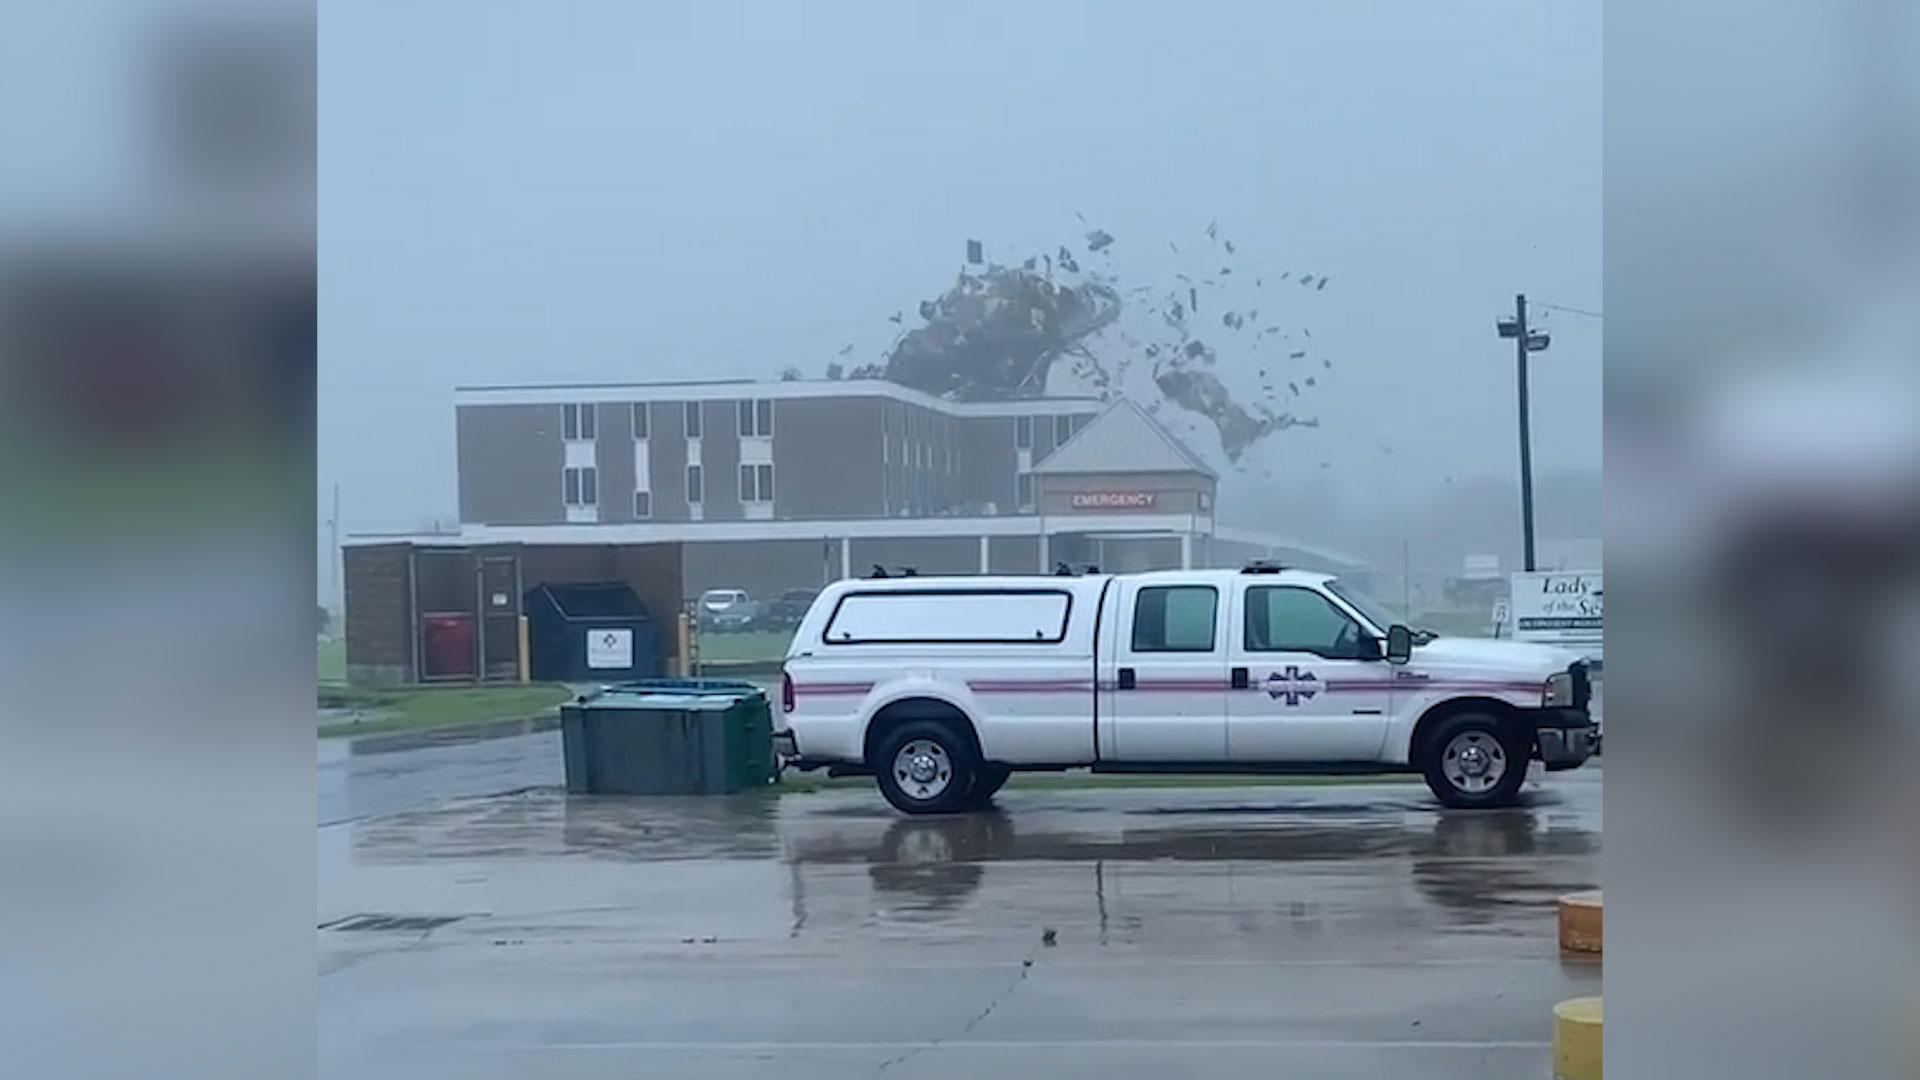 Watch: Damage scenes across Louisiana after Hurricane Ida makes landfall